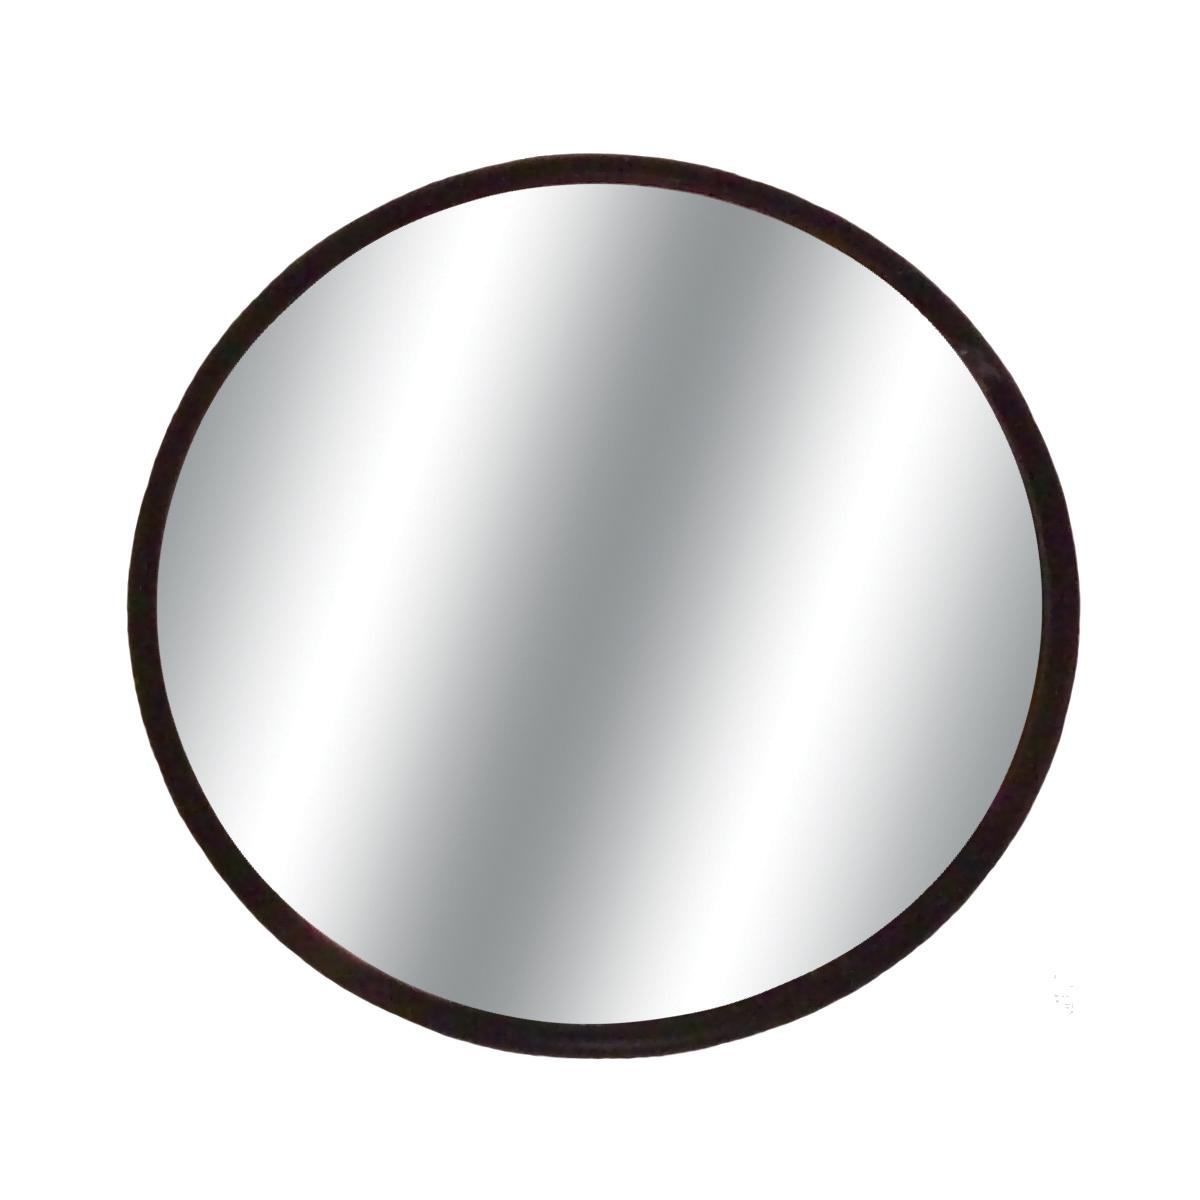 Round 3 75 Convex Glass W Stick On Mount Black Blind